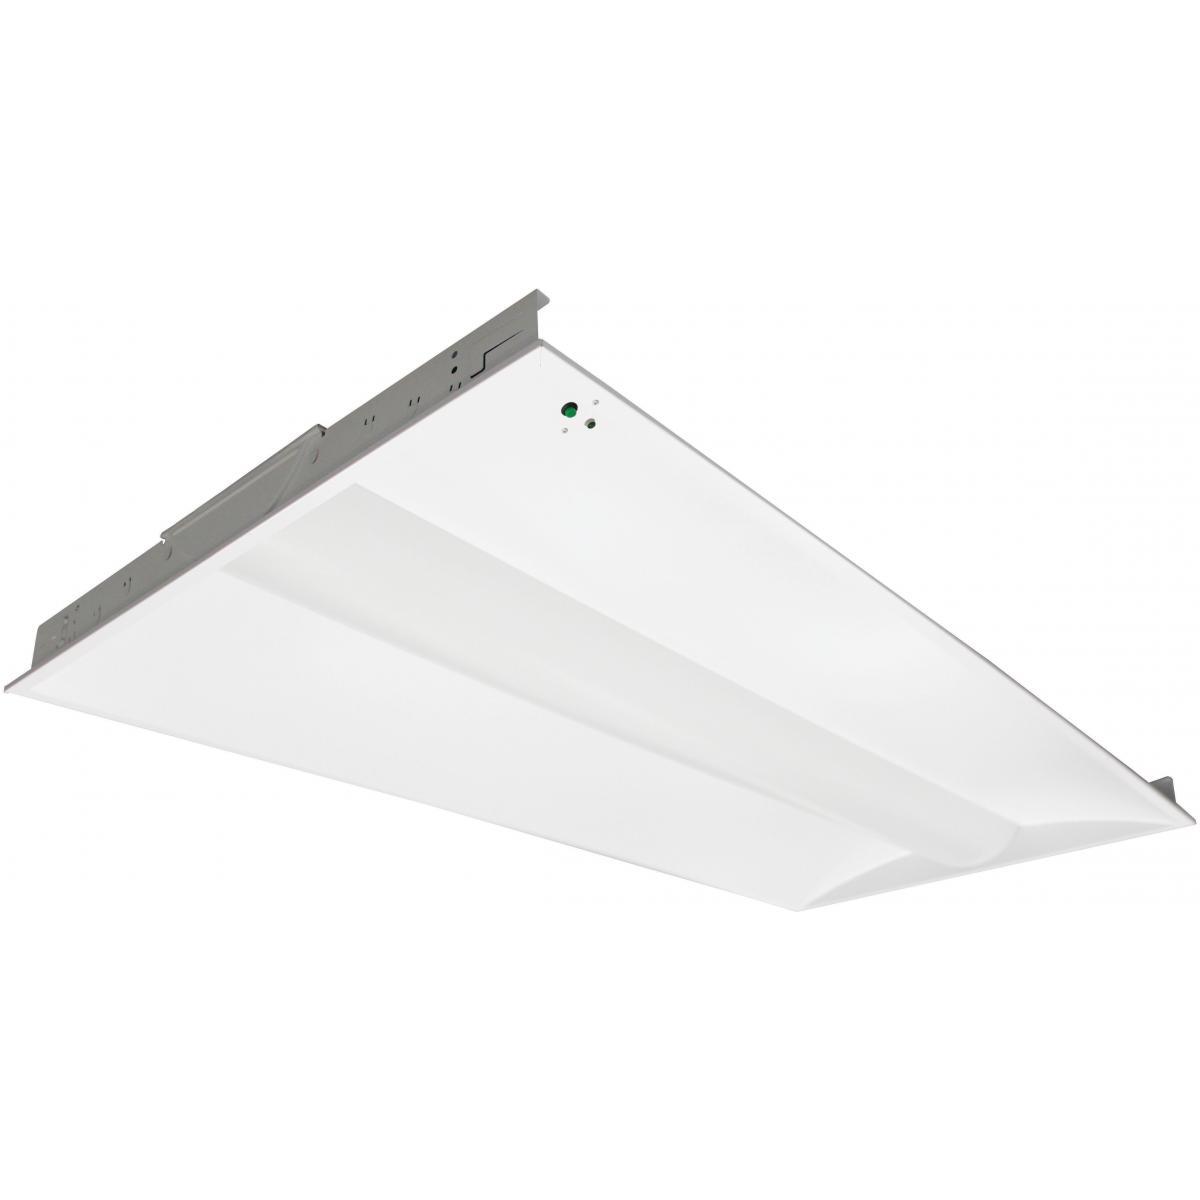 65-452 2FT X 4FT EM LED TROFFER 40W